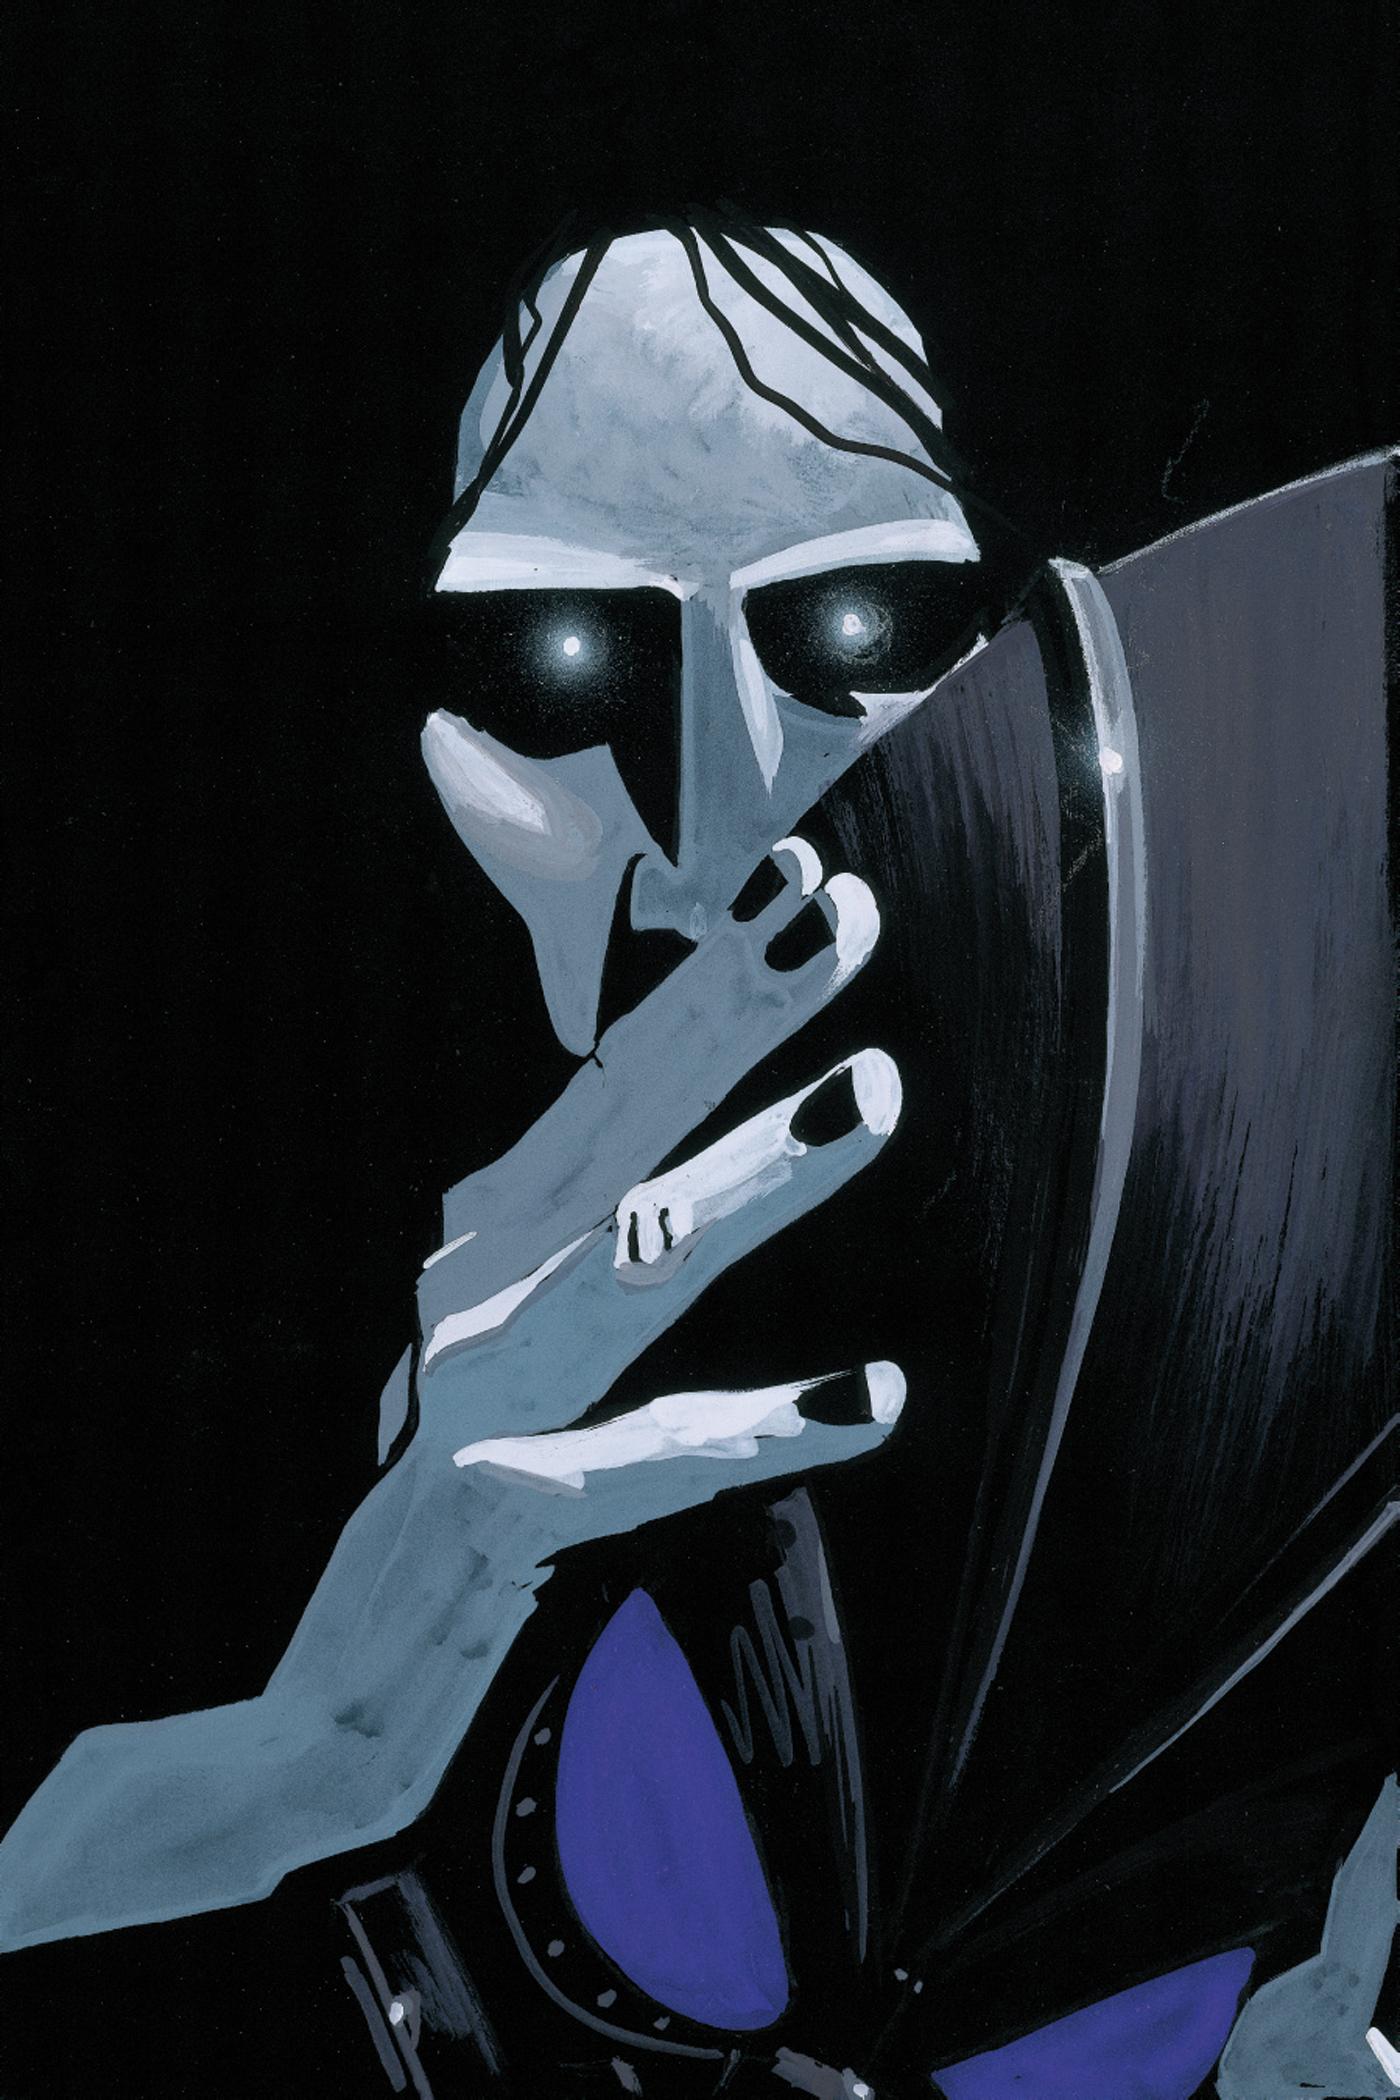 https://www.urban-comics.com/wp-content/uploads/2013/11/sandmancouverture1.jpg